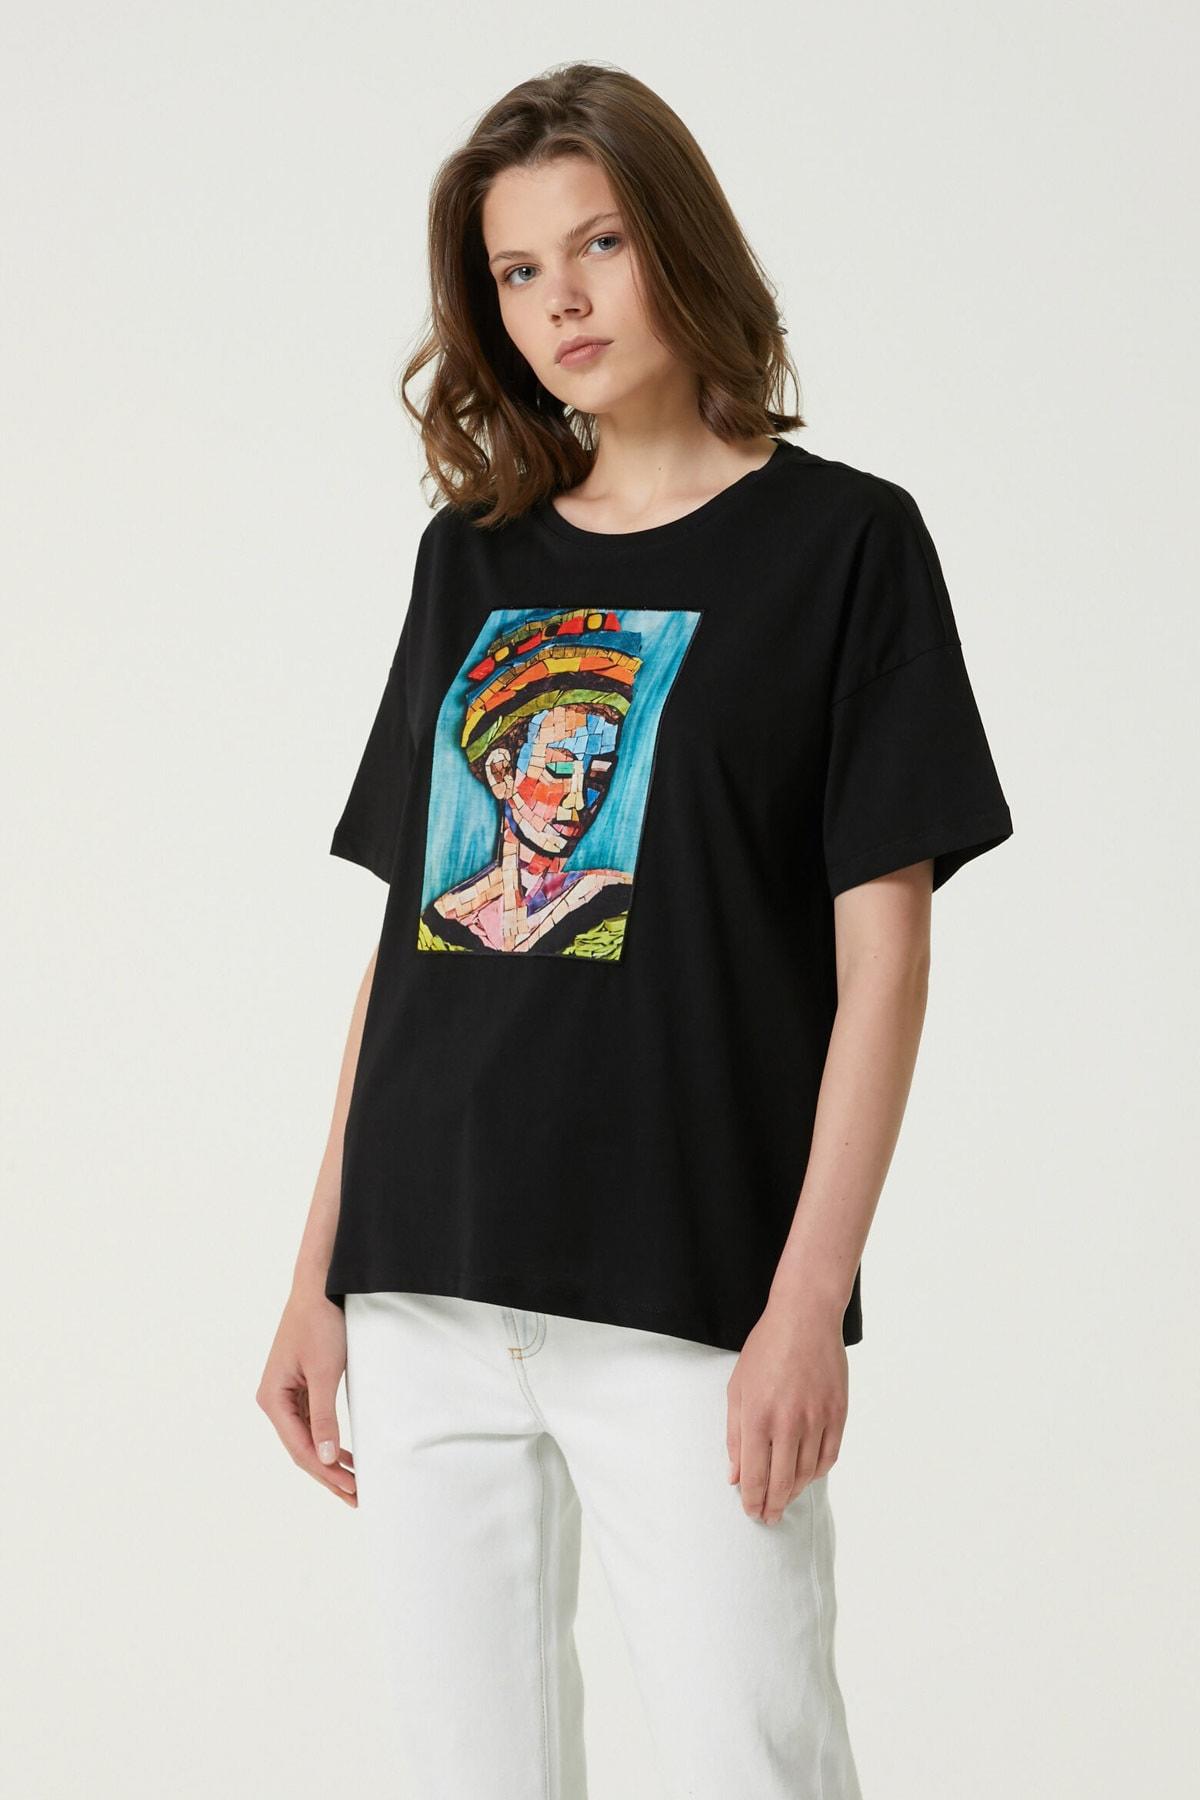 Kadın Geniş Fit Siyah Baskılı T-shirt 1079942